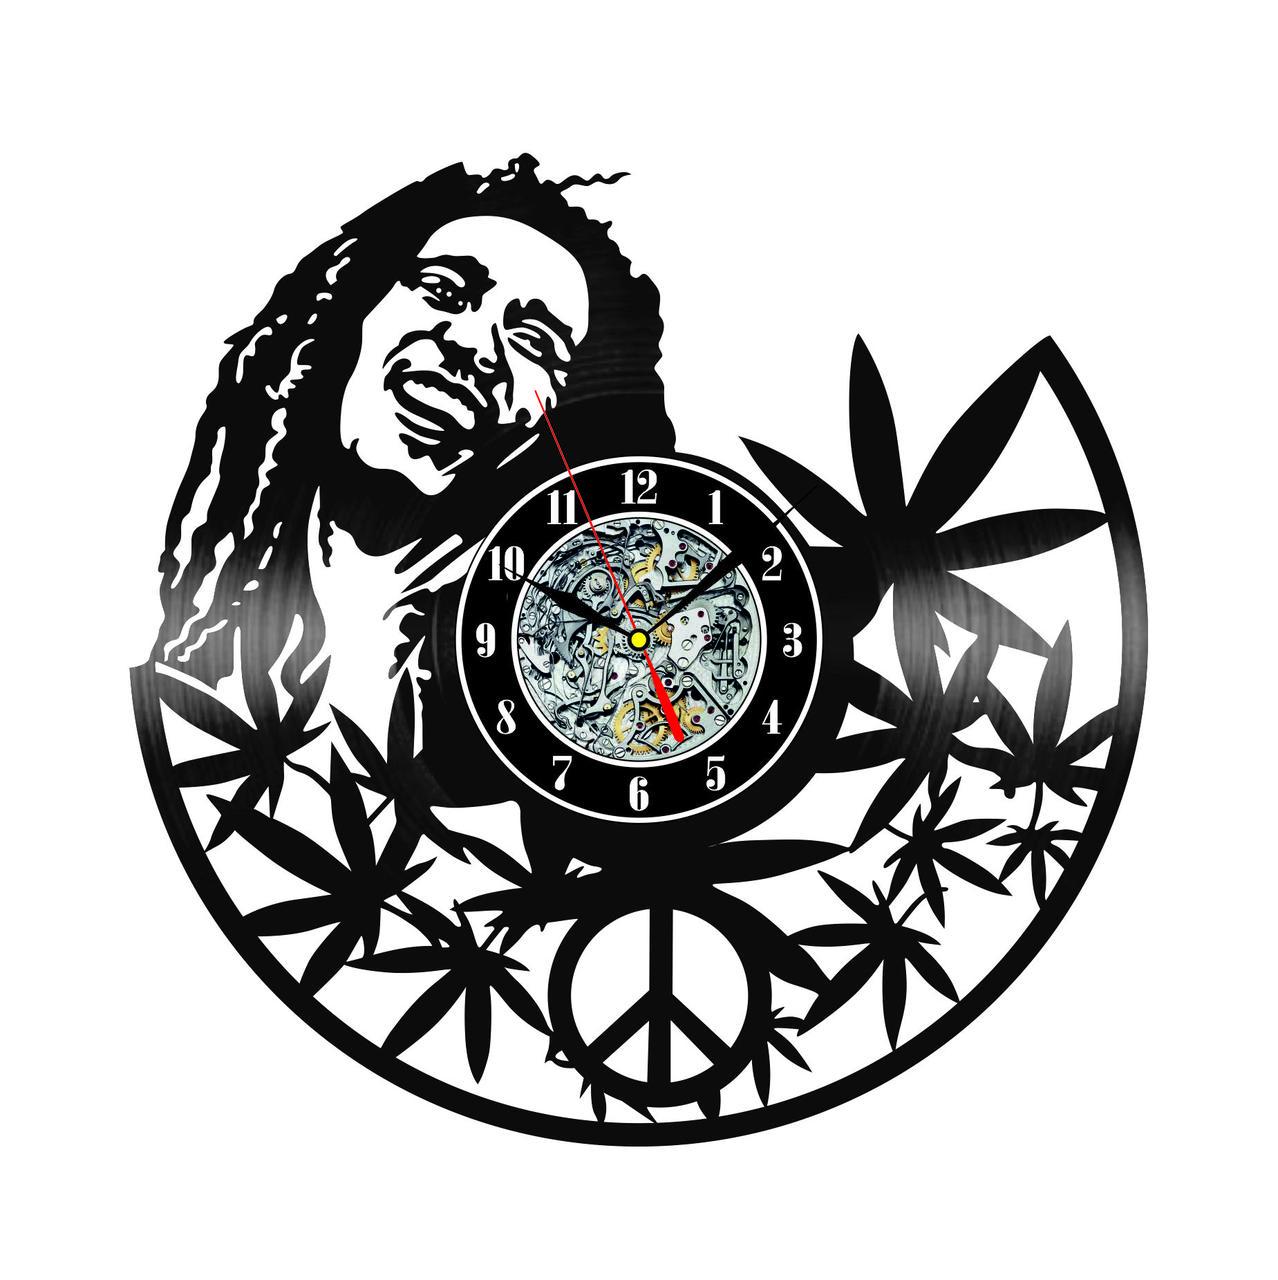 Настенные часы из виниловых пластинок LikeMark Bob Marley